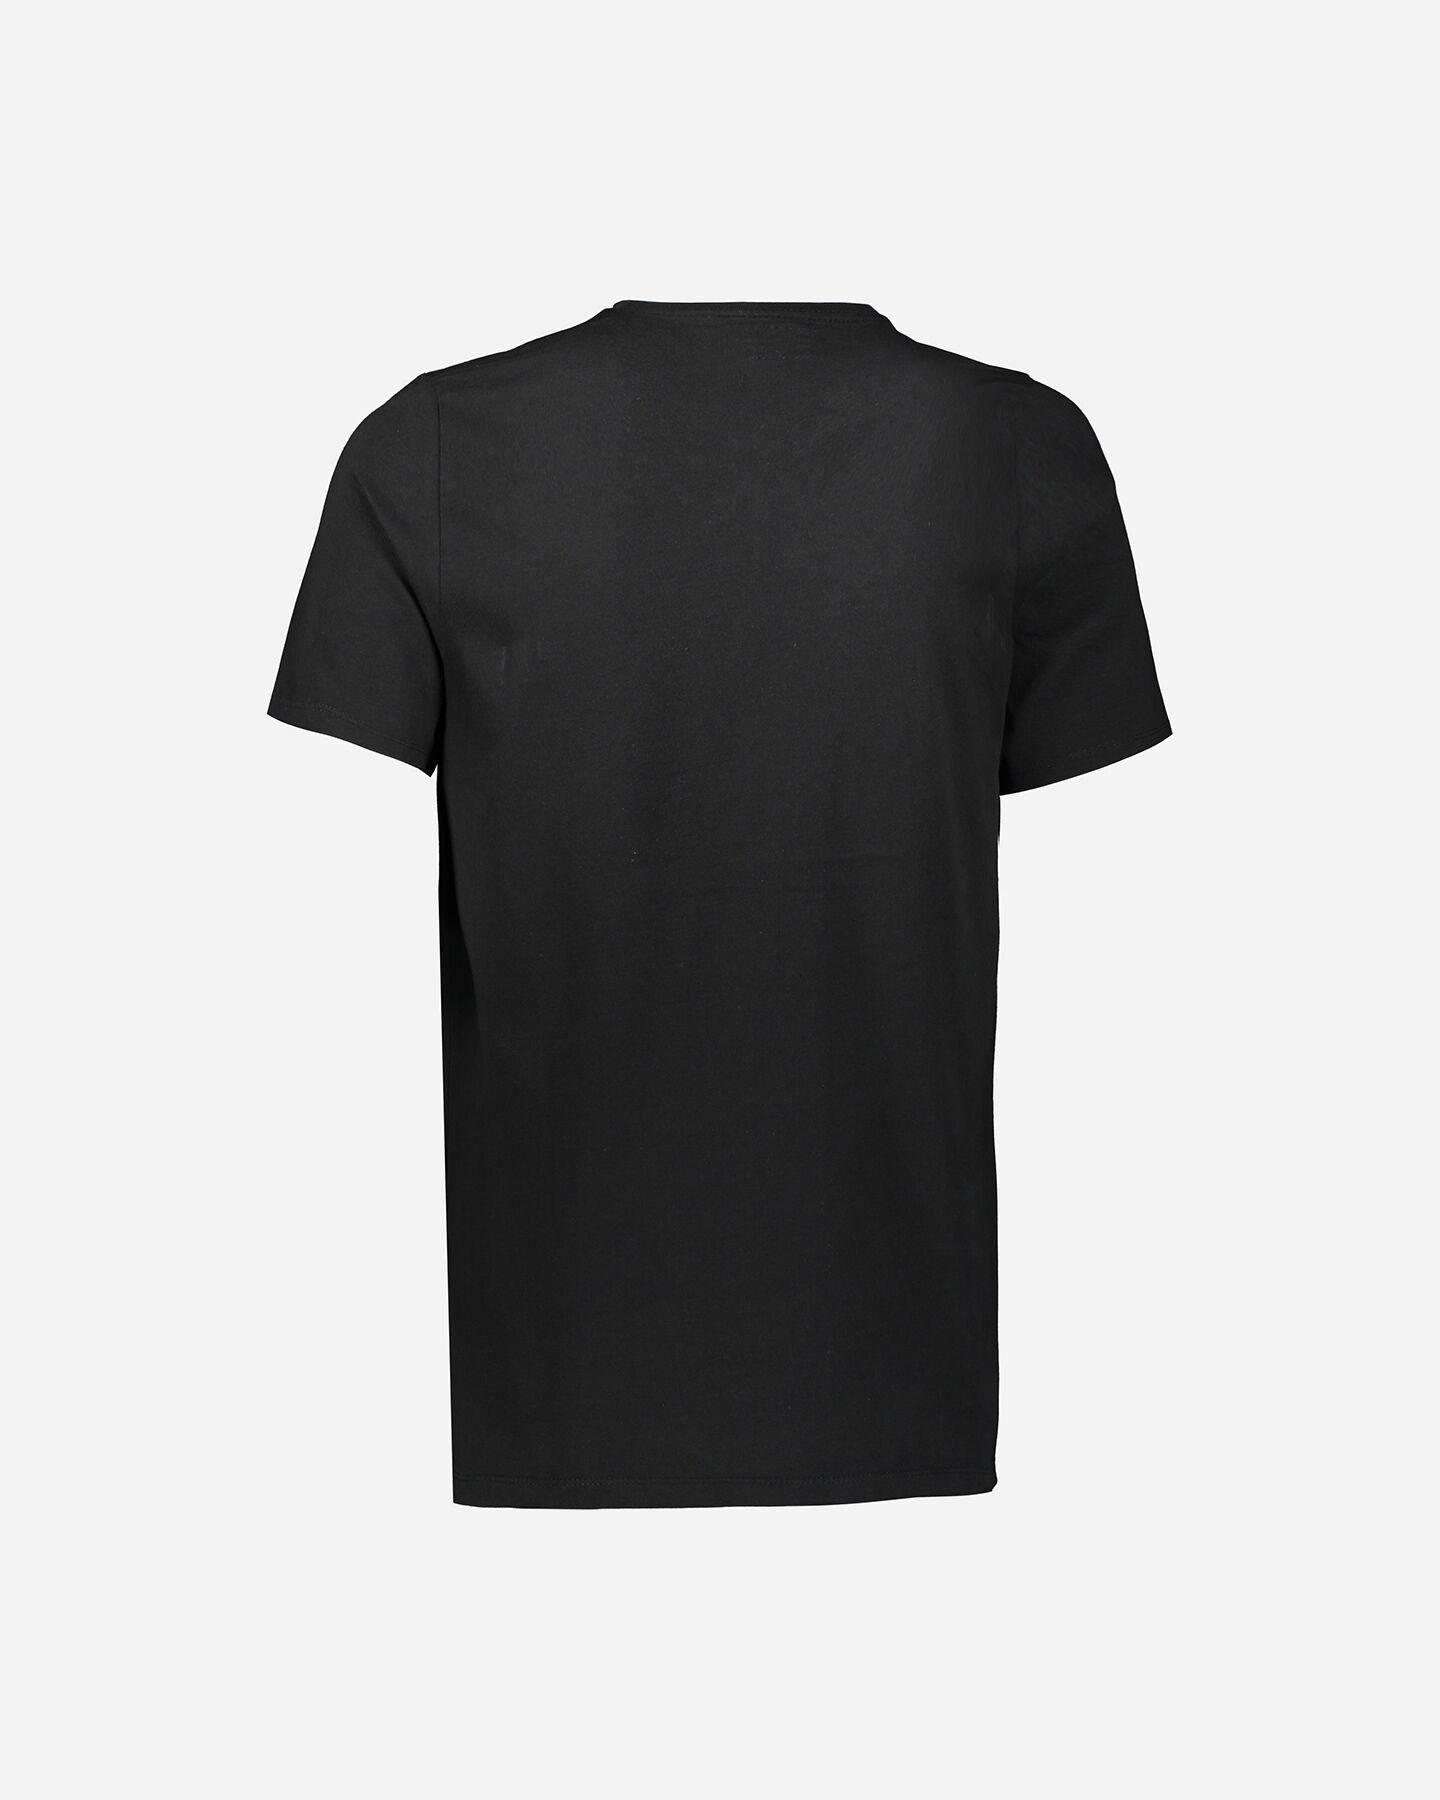 T-Shirt LEVI'S ORIGINAL M S4076919 scatto 1